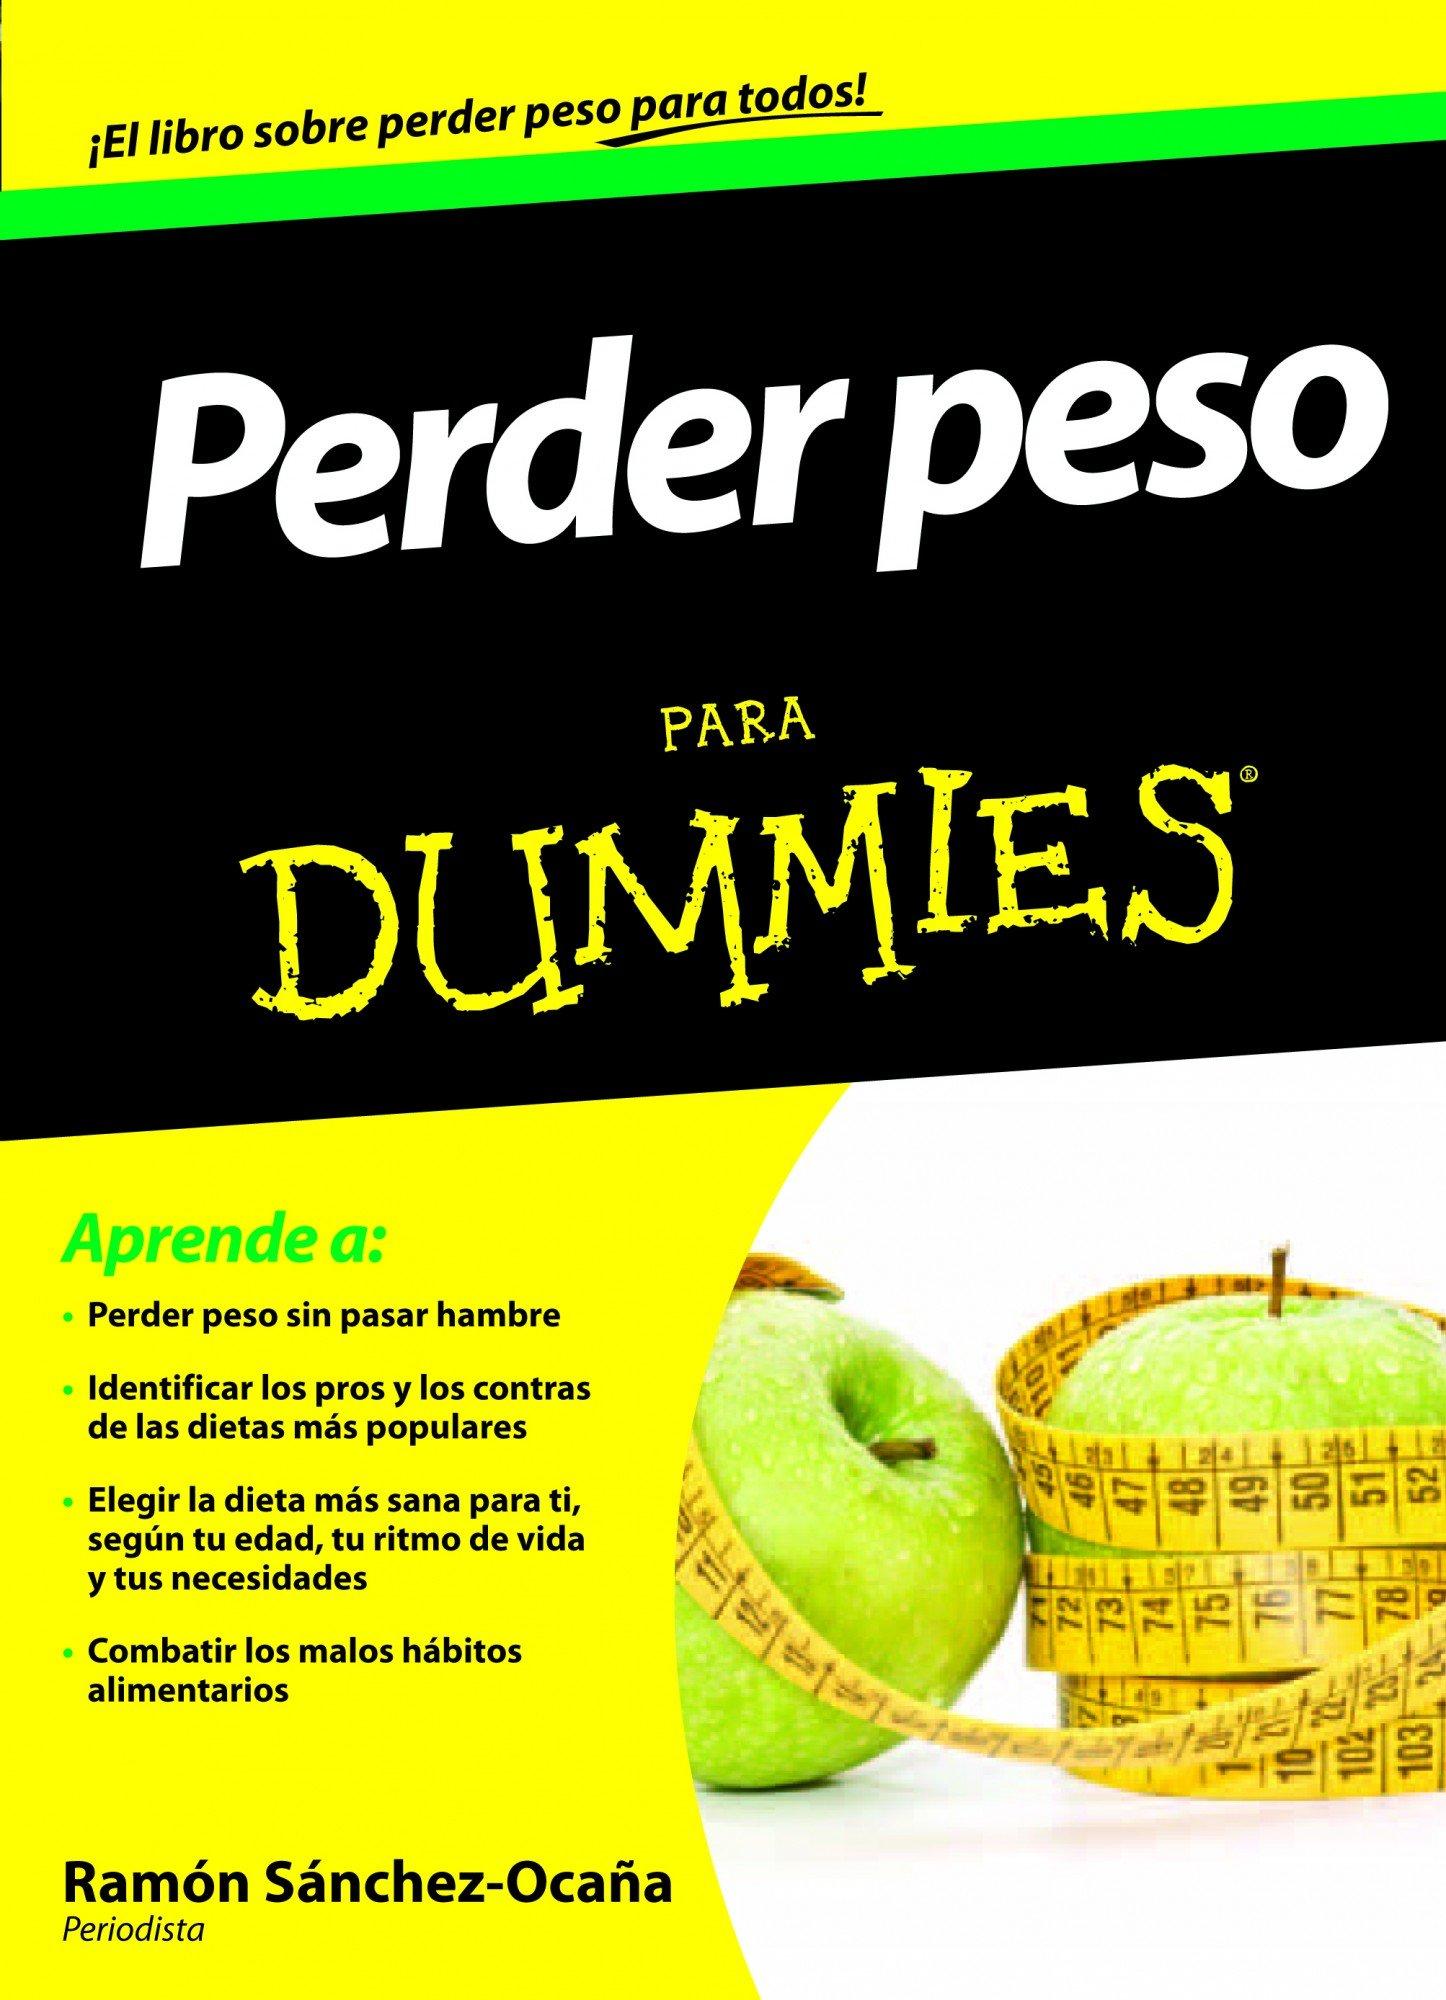 Perder peso para dummies: Amazon.es: Sánchez-Ocaña, Ramón: Libros